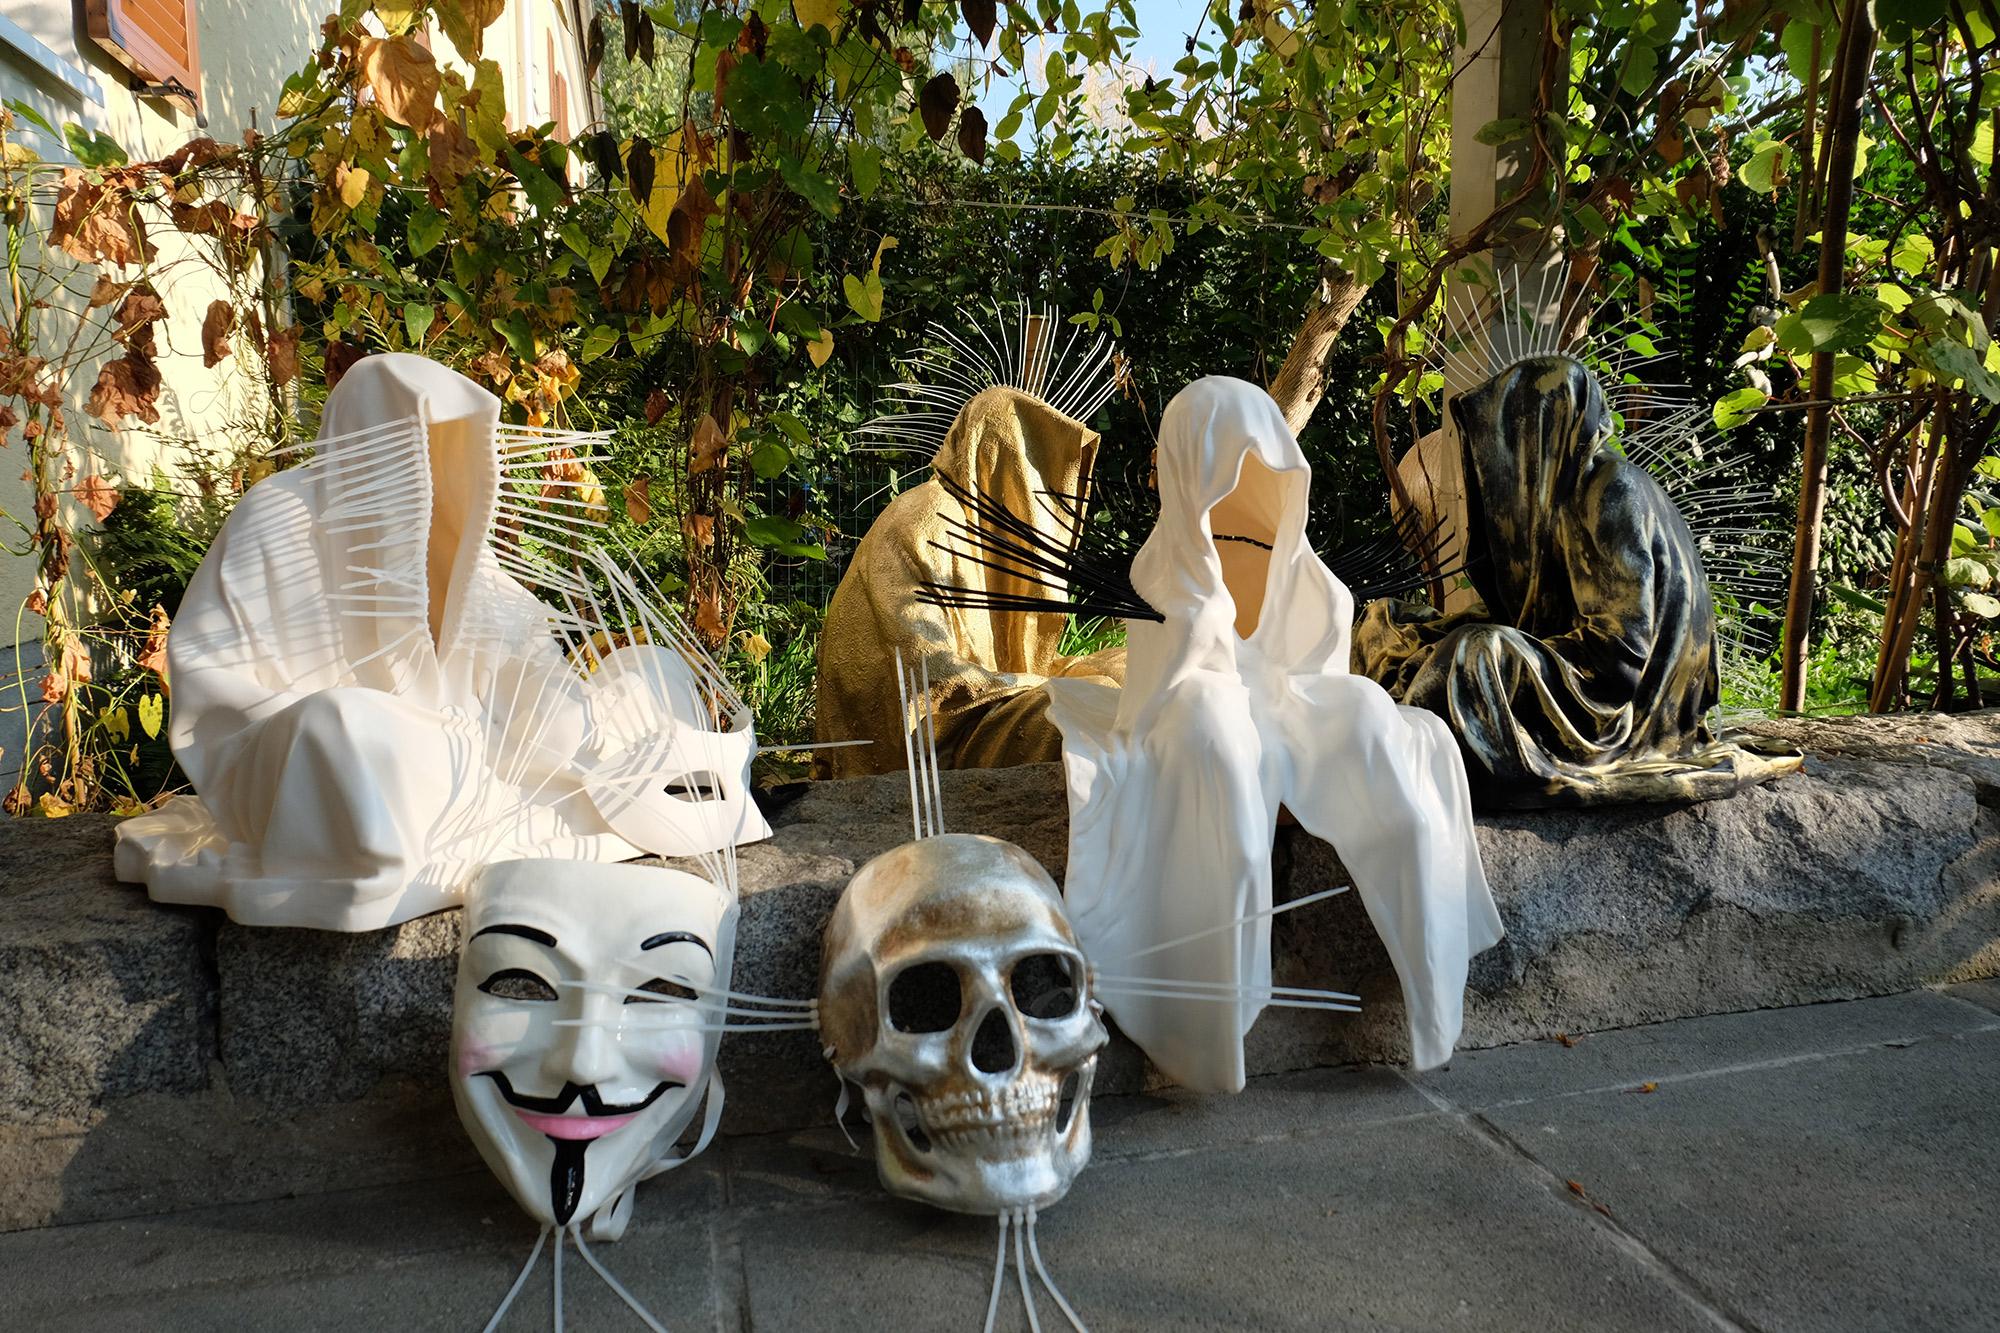 #faceless-#mask-#cableties-#ziptie-ty-#guardiansoftime-#manfredkielnhofer-#contemporaryart-#arts-#design-#sculpture-#statue-#museum-#gallery-#fineart-#lightart-#ghost-#anonymous-8090